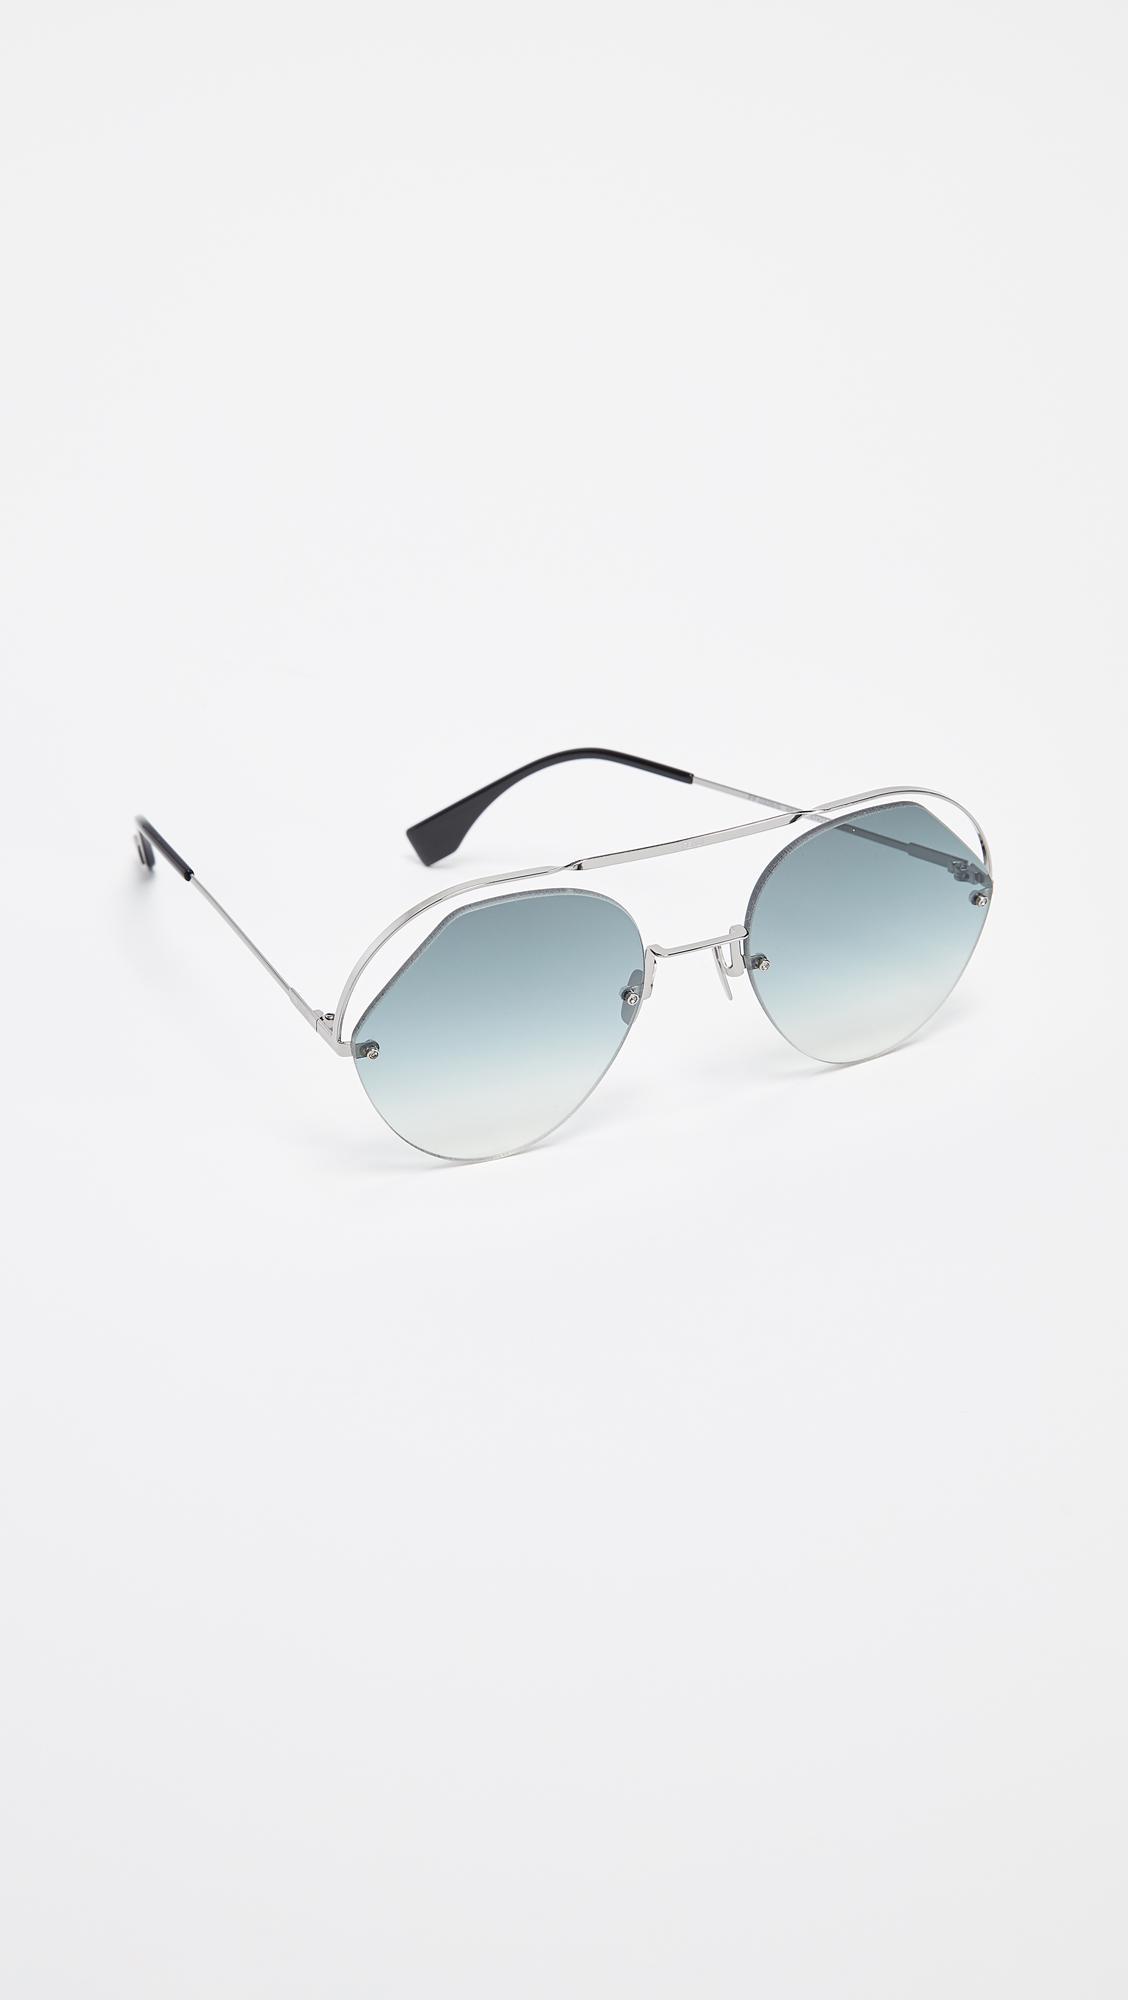 c2093253ae2 Fendi - Gray Cut Out Aviator Sunglasses - Lyst. View fullscreen